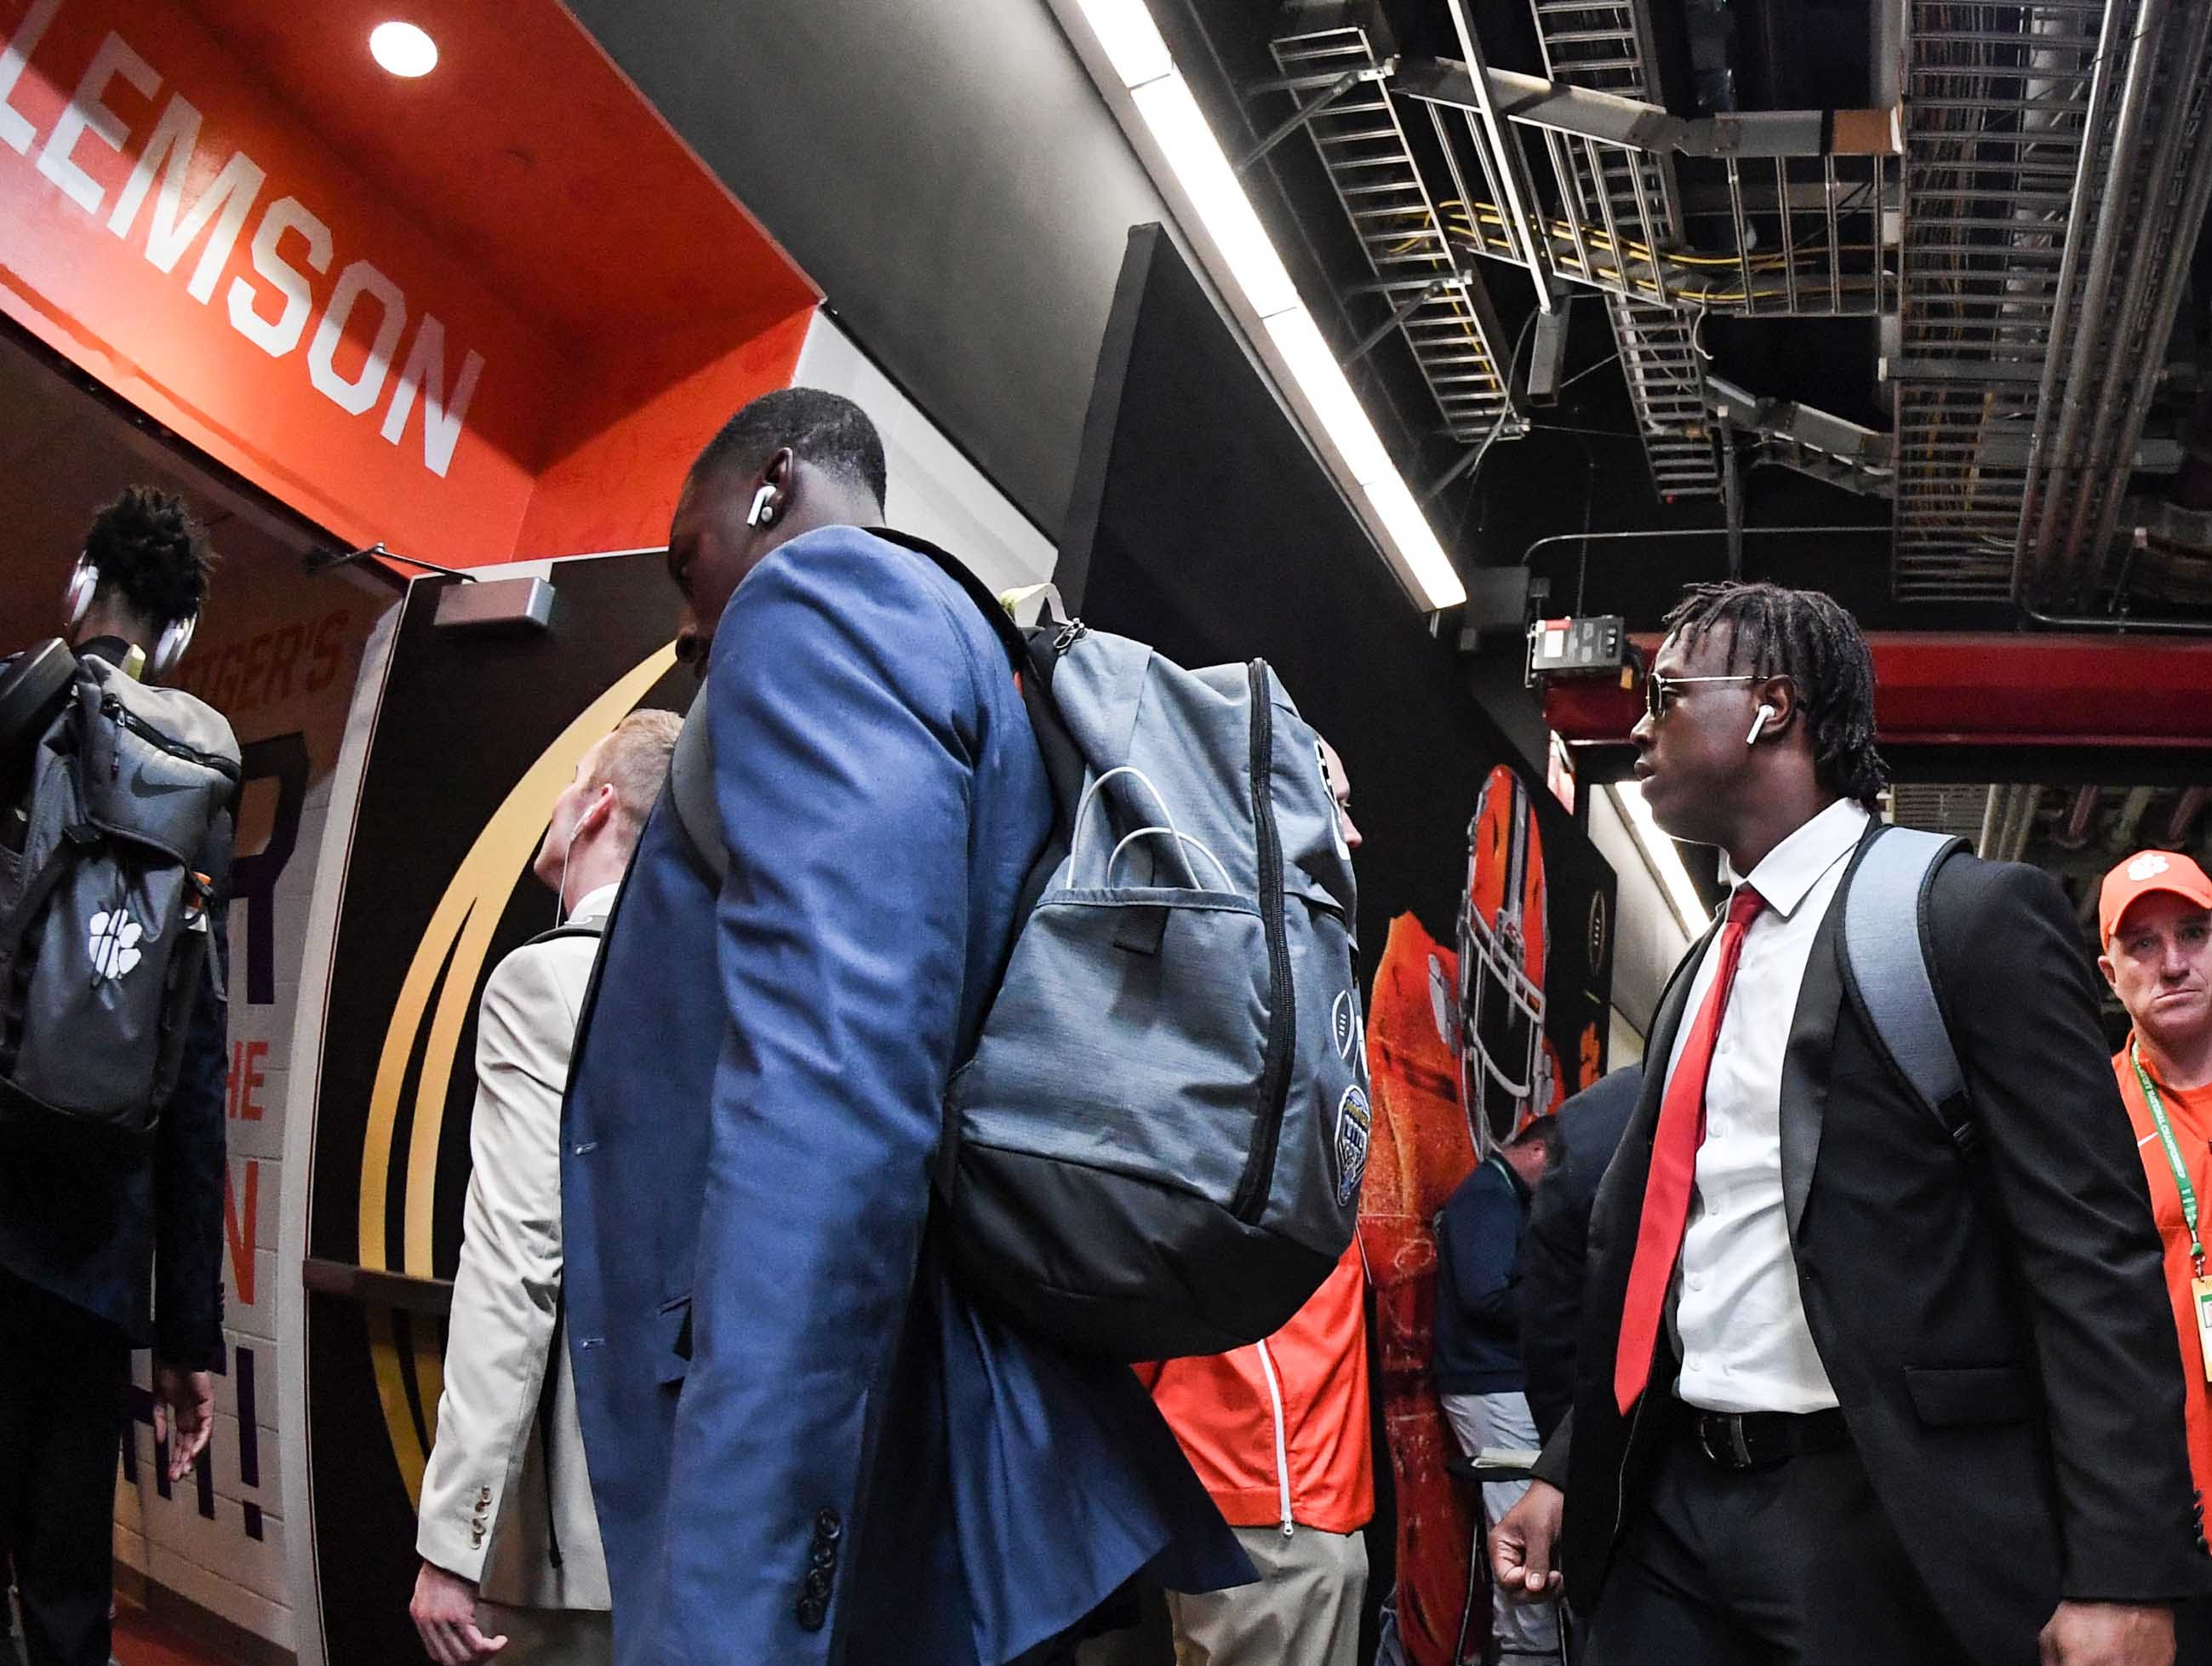 Clemson running back Travis Etienne (9) and teammates arrive before kickoff at Levi's Stadium in Santa Clara, California Monday, January 7, 2019.